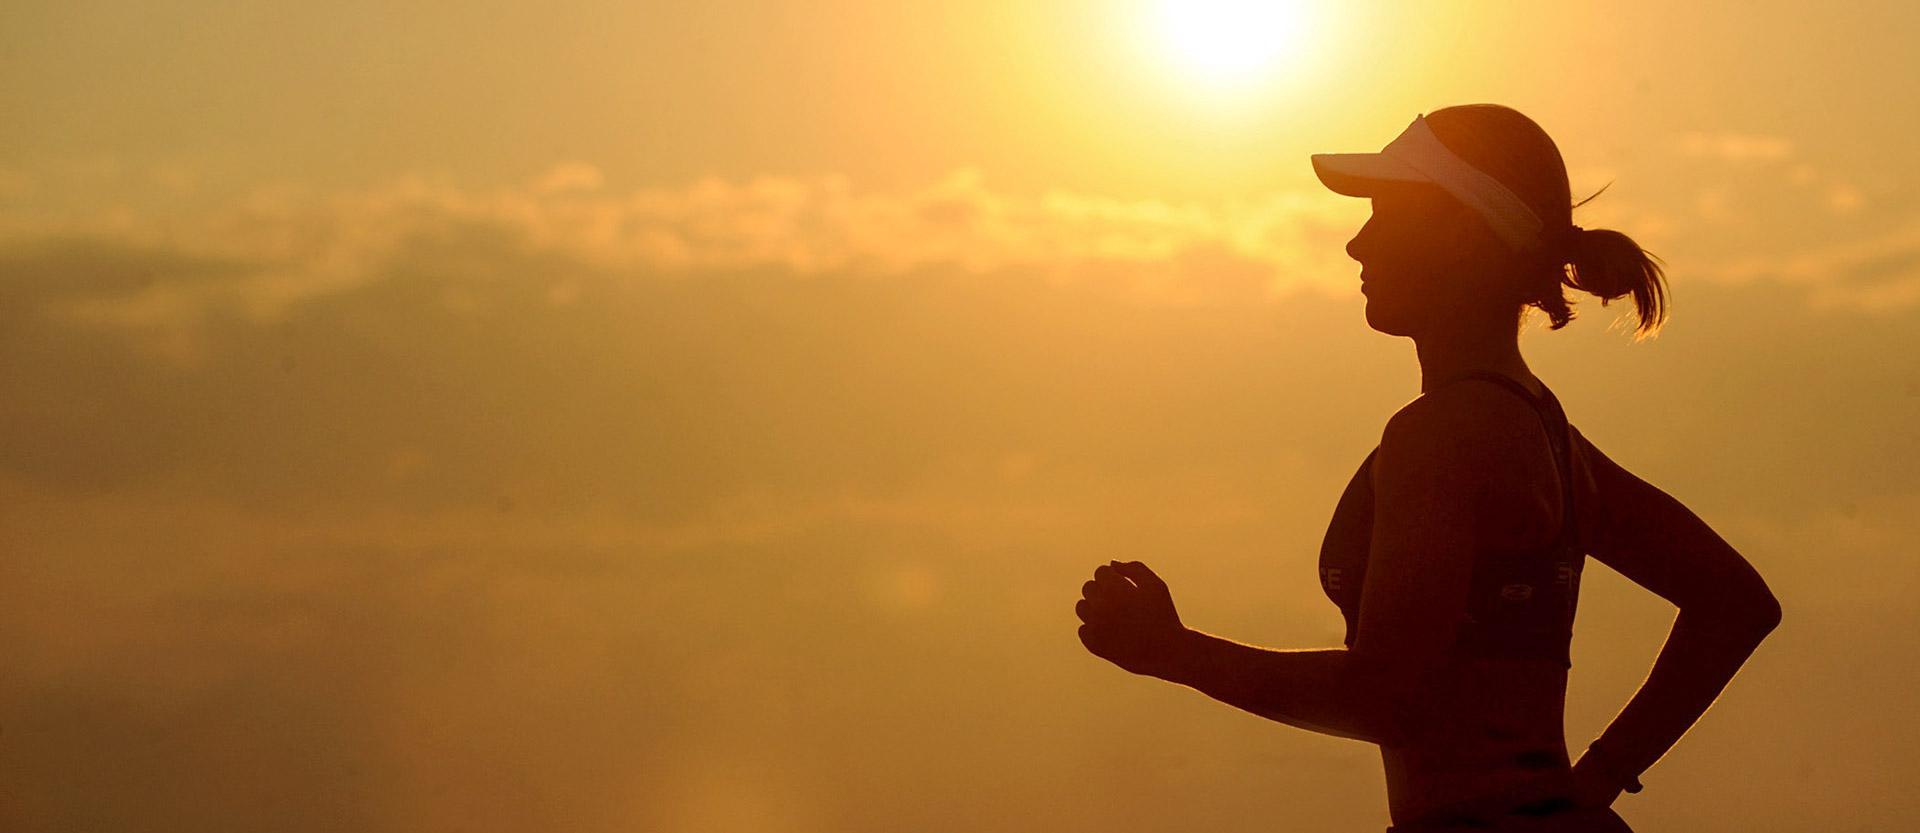 sport - giovanna pitotti biologo nutrizionista